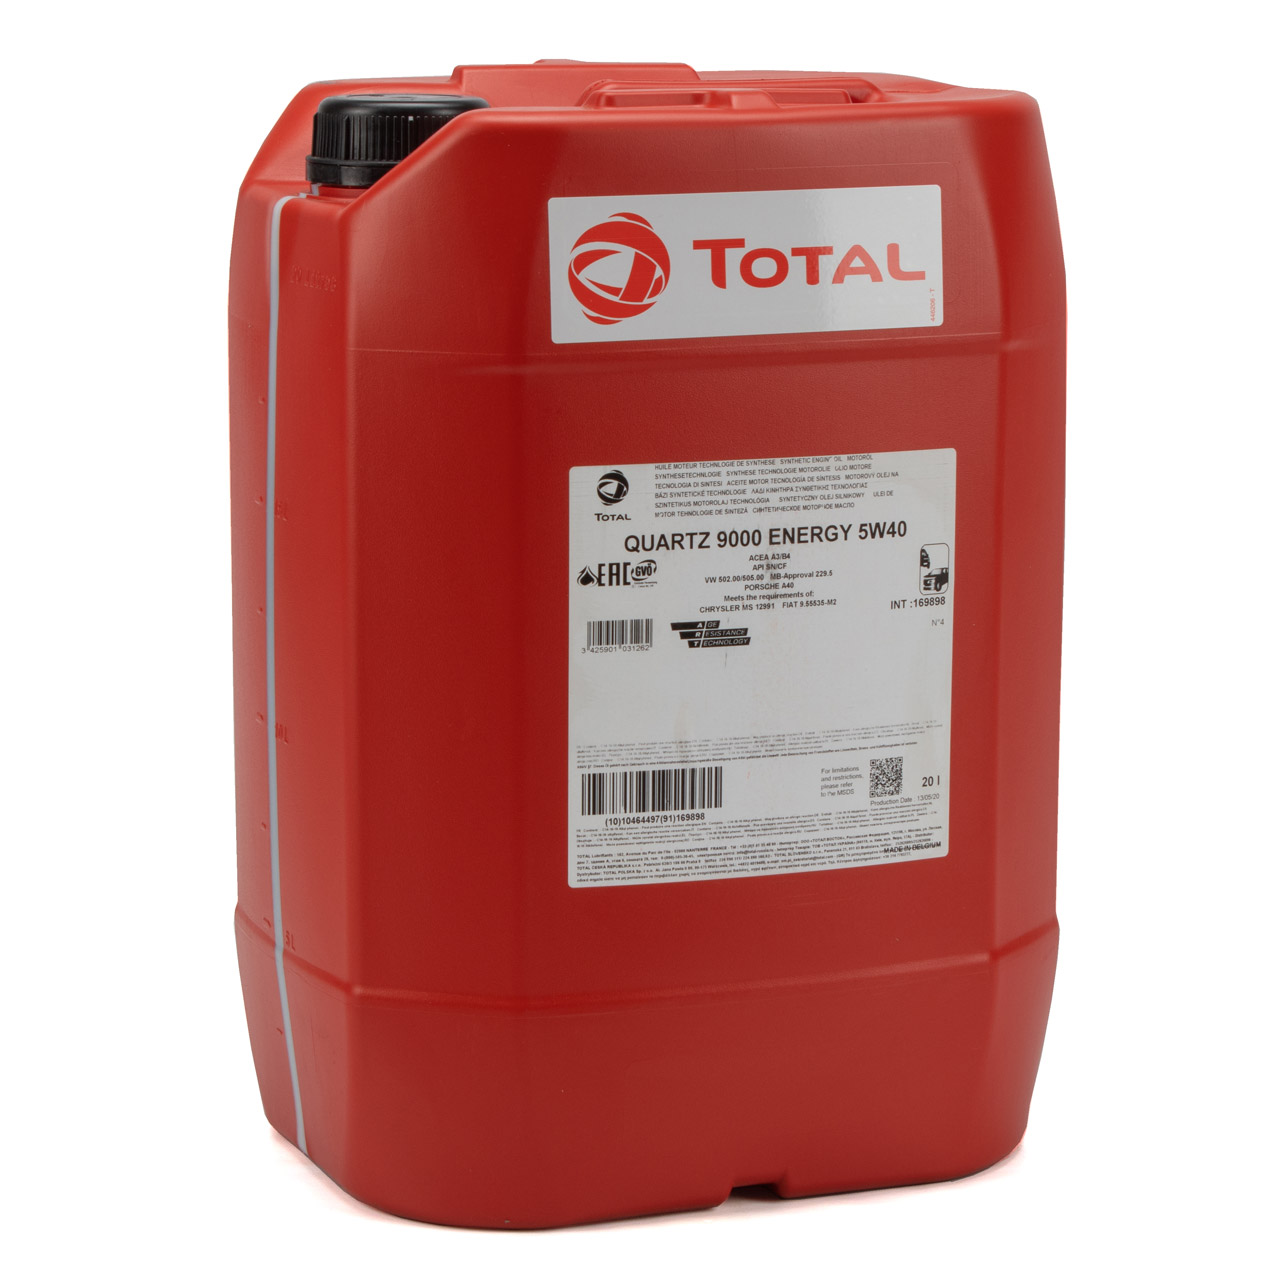 TOTAL QUARTZ 9000 ENERGY 5W-40 Motoröl VW 502.00 505.00 MB 229.5 - 20L 20 Liter